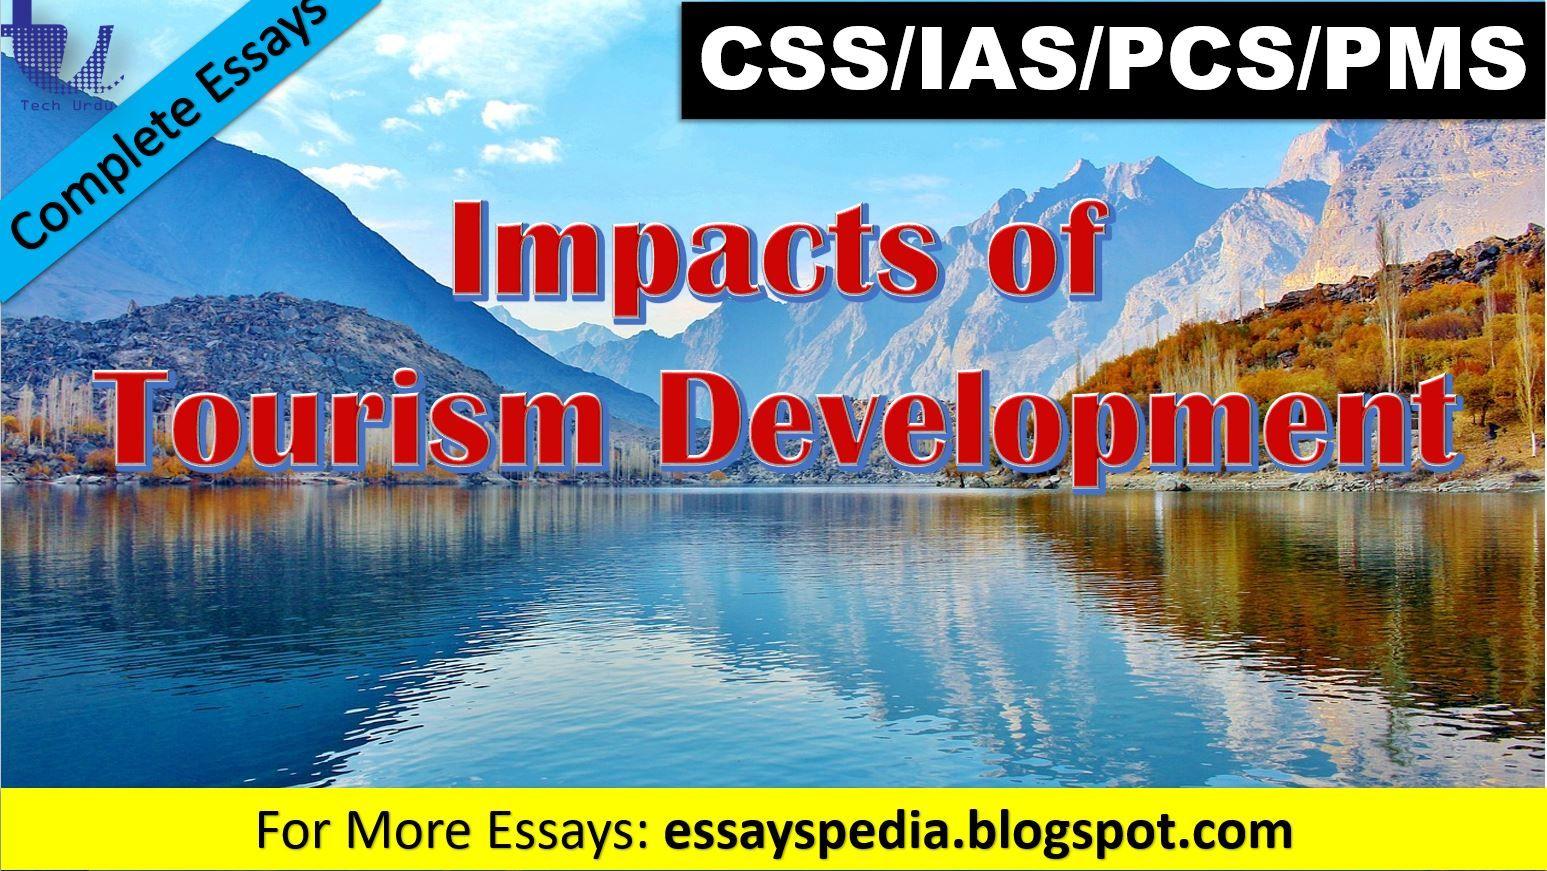 The Impact Of Tourism Development Complete Essay With Outline Essayspedia Essays Advantage And Disadvantage Mas Pdf